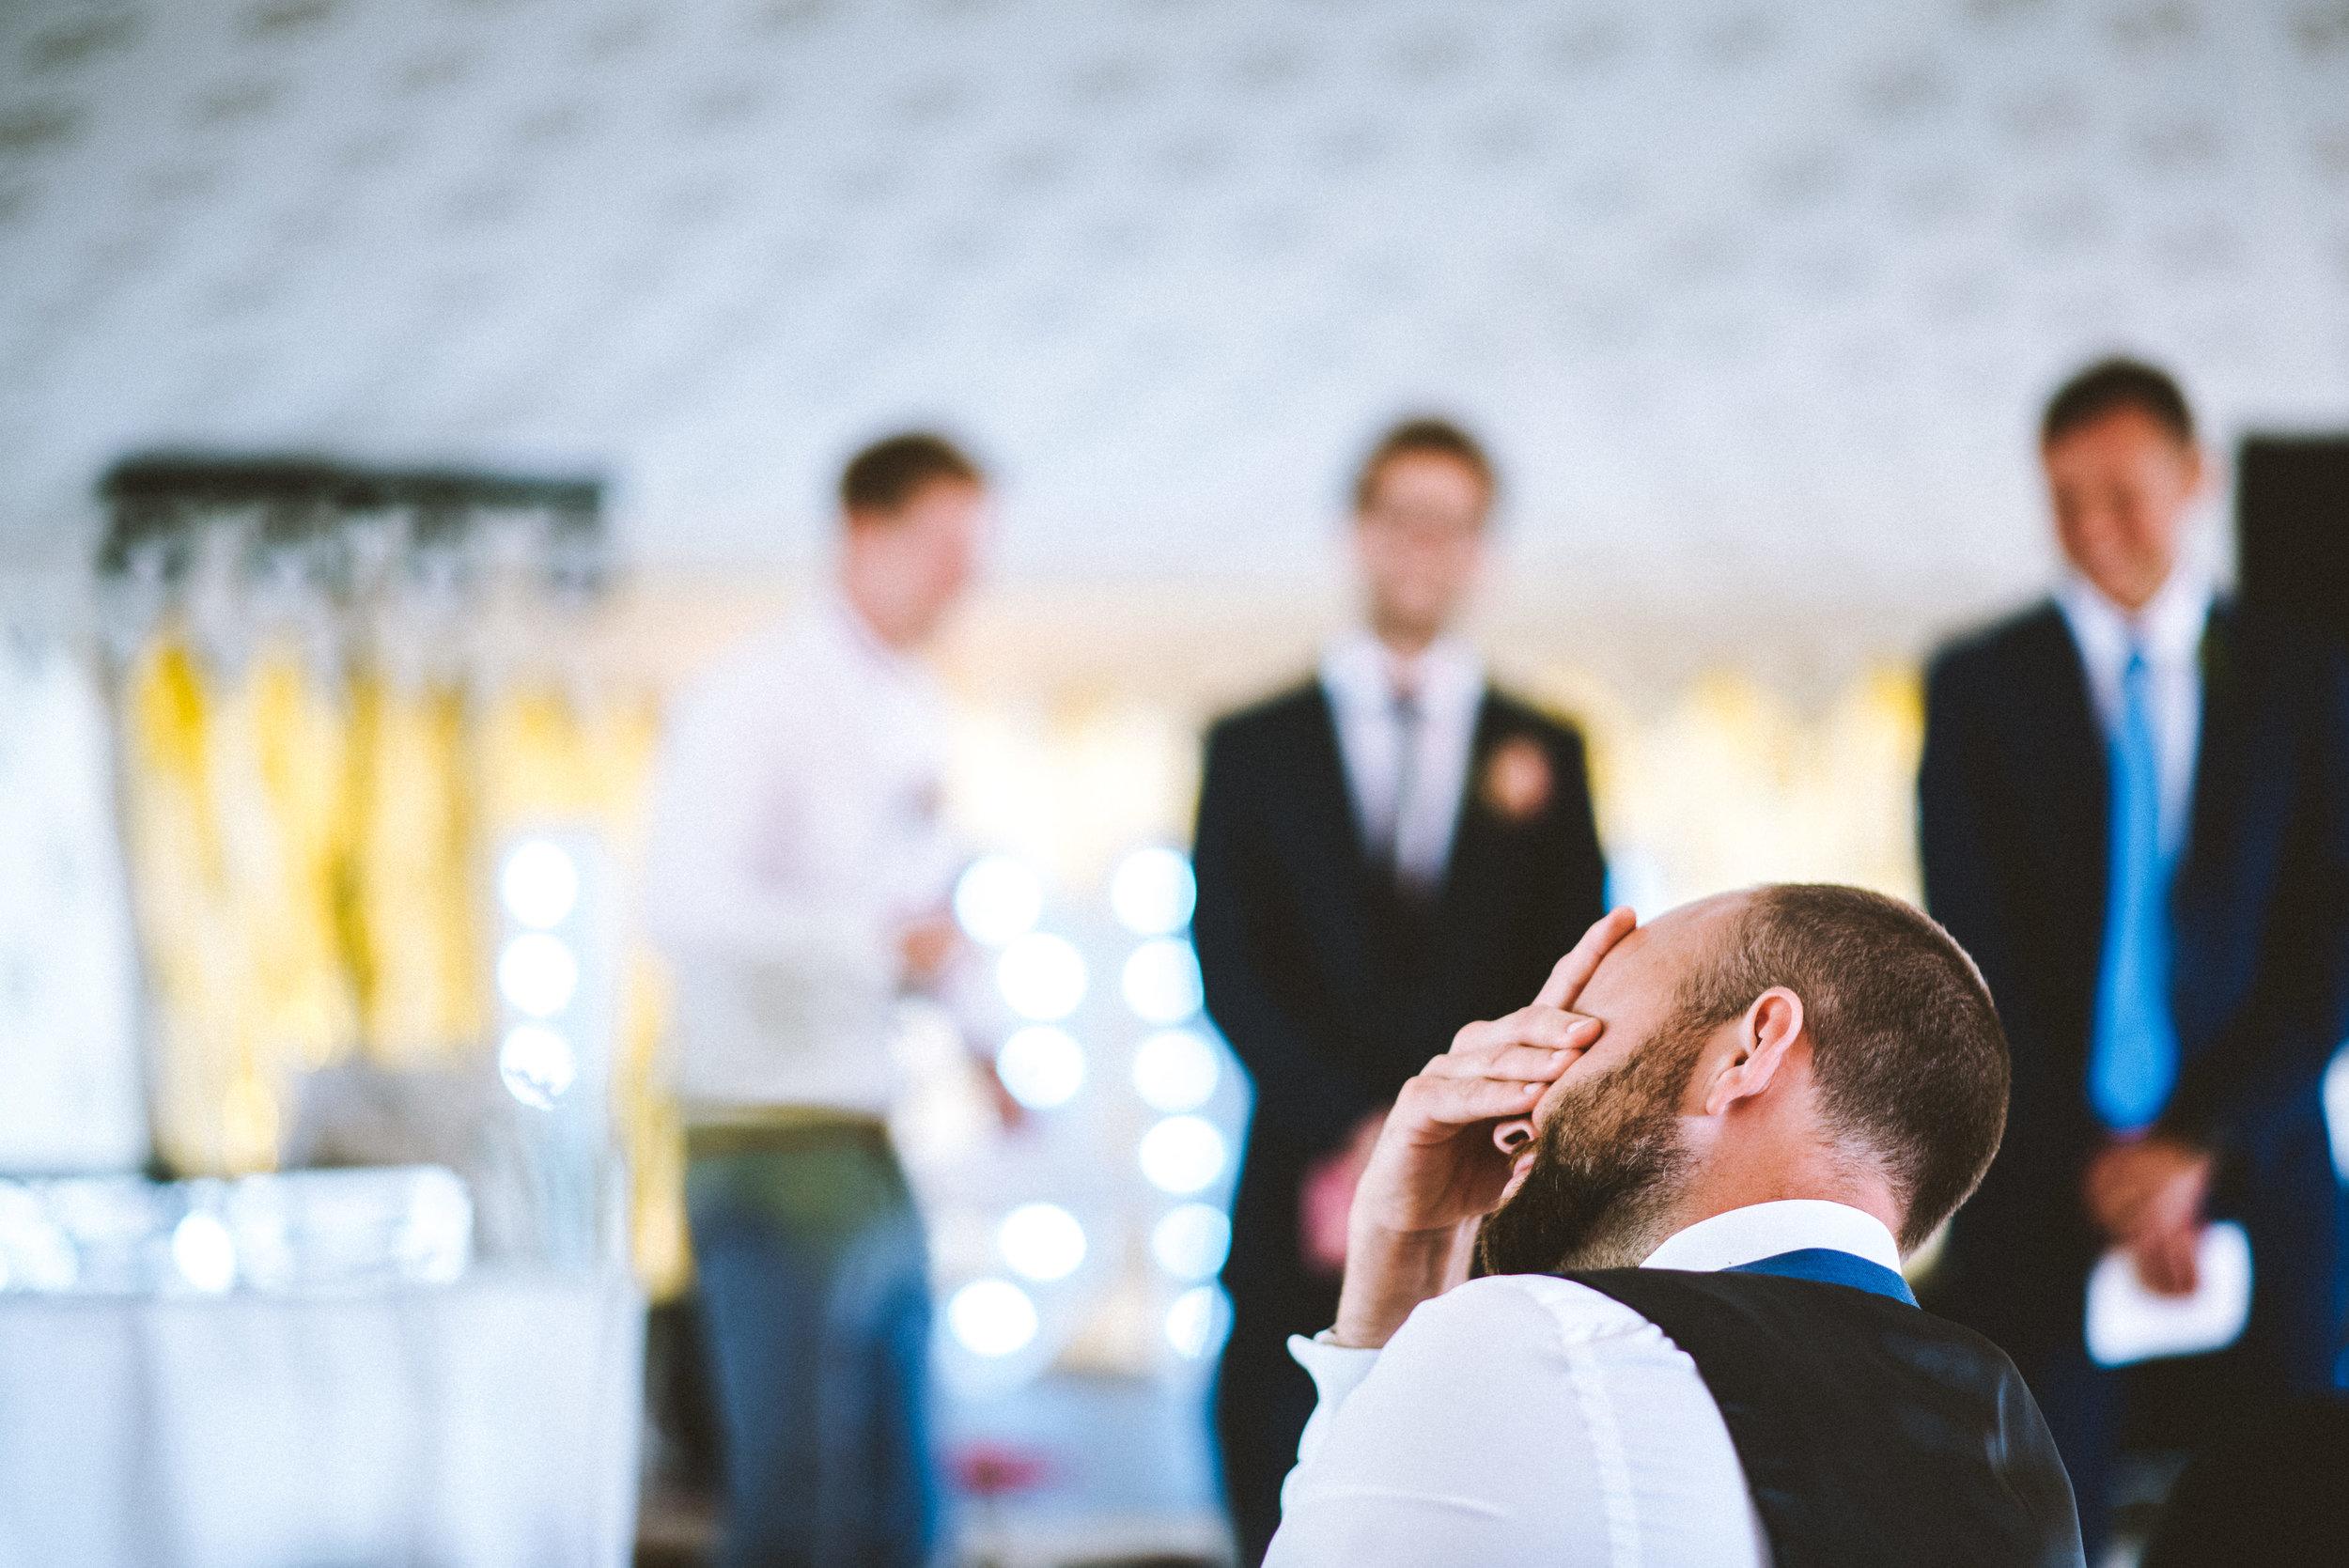 pencarrow-house-wedding-photographer-114.jpg